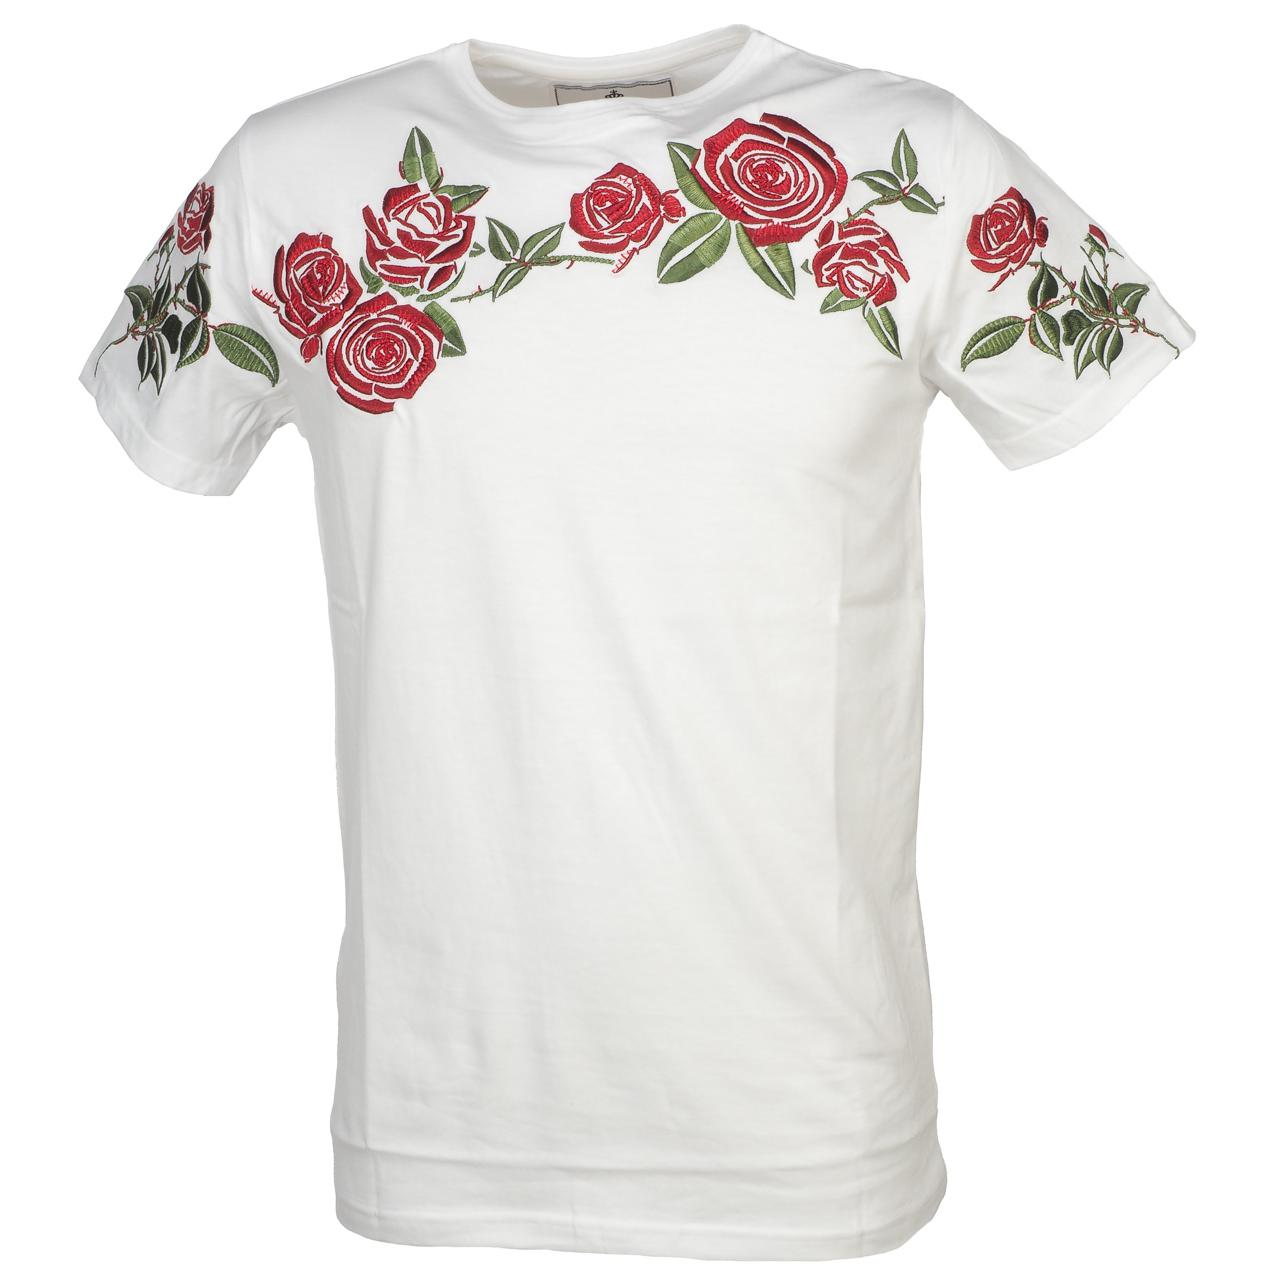 Short-Sleeve-T-Shirt-Hite-Couture-Madiner-White-Mc-Tee-White-11526-New